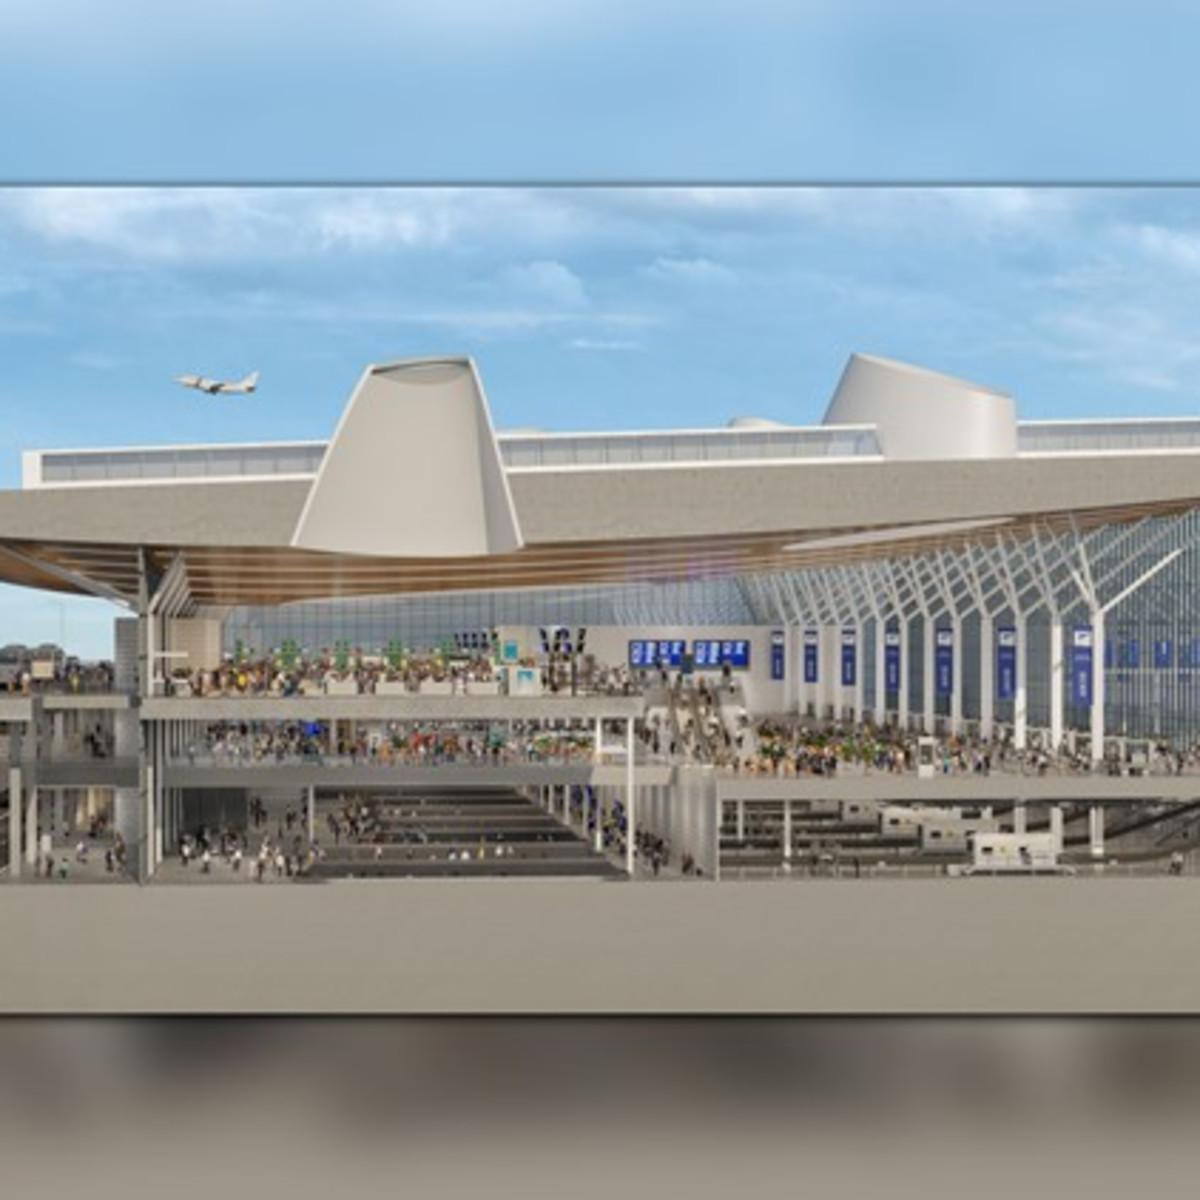 Austin airport expansion